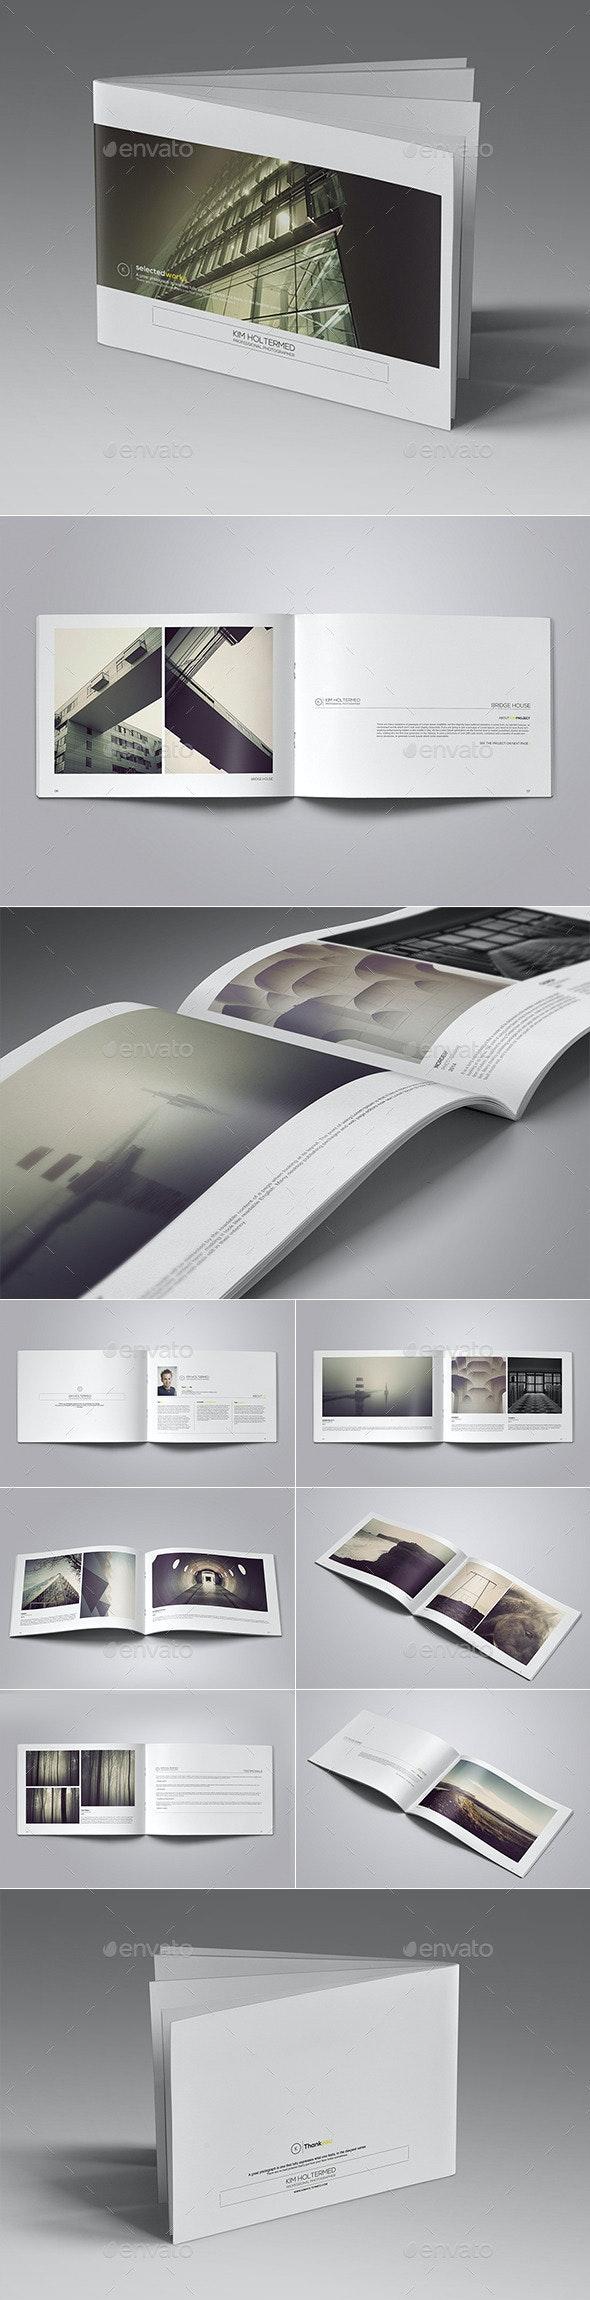 Personal Portfolio Template Vol. I - Portfolio Brochures